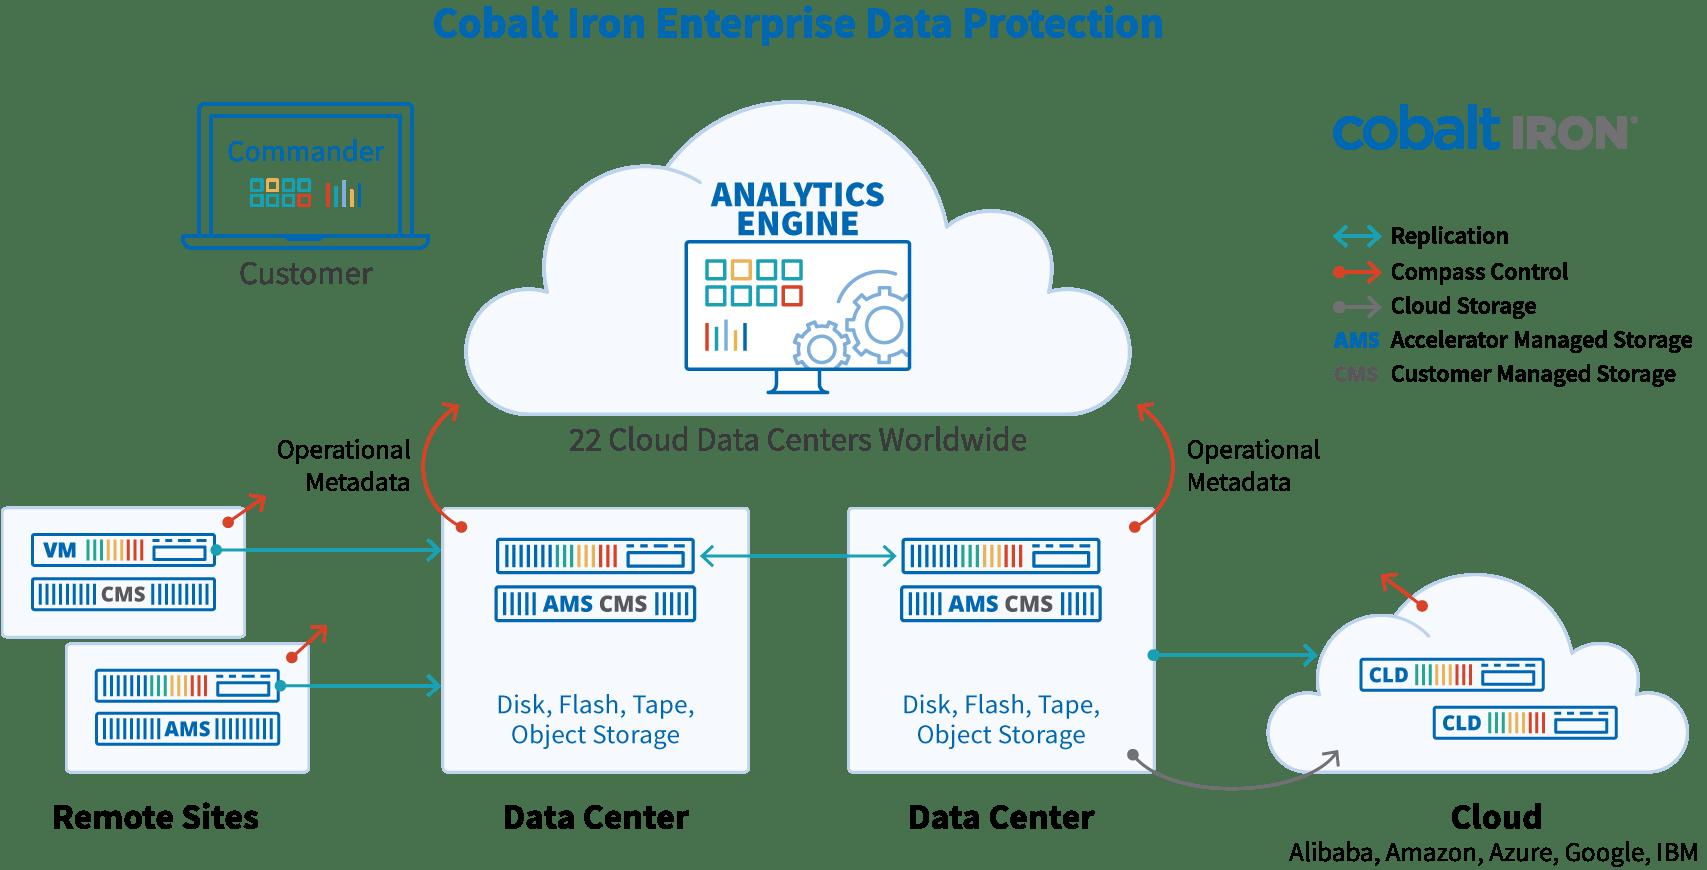 Cobalt Iron Enterprise Data Protection Diagram